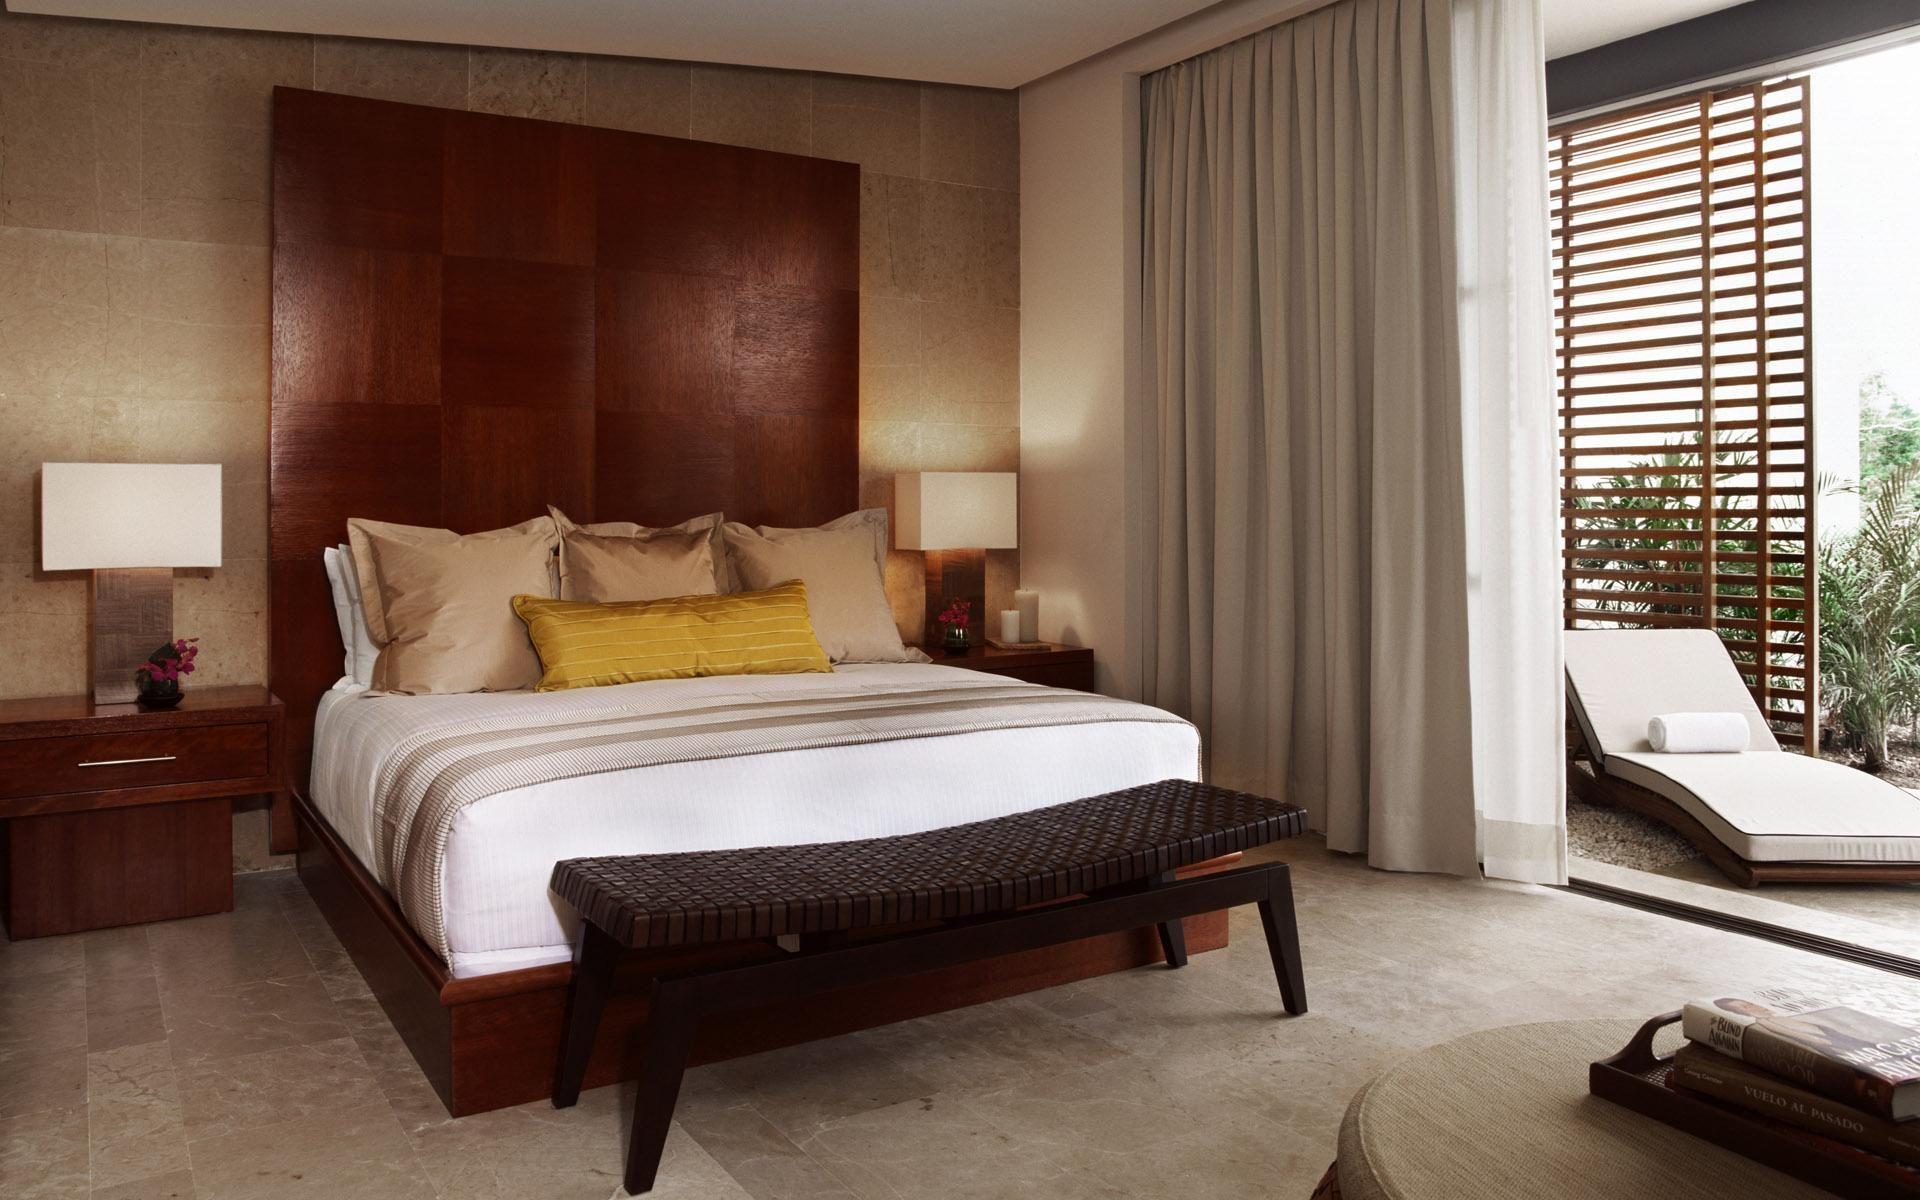 Stylish Modern Bedroom Interior Design Interior Design